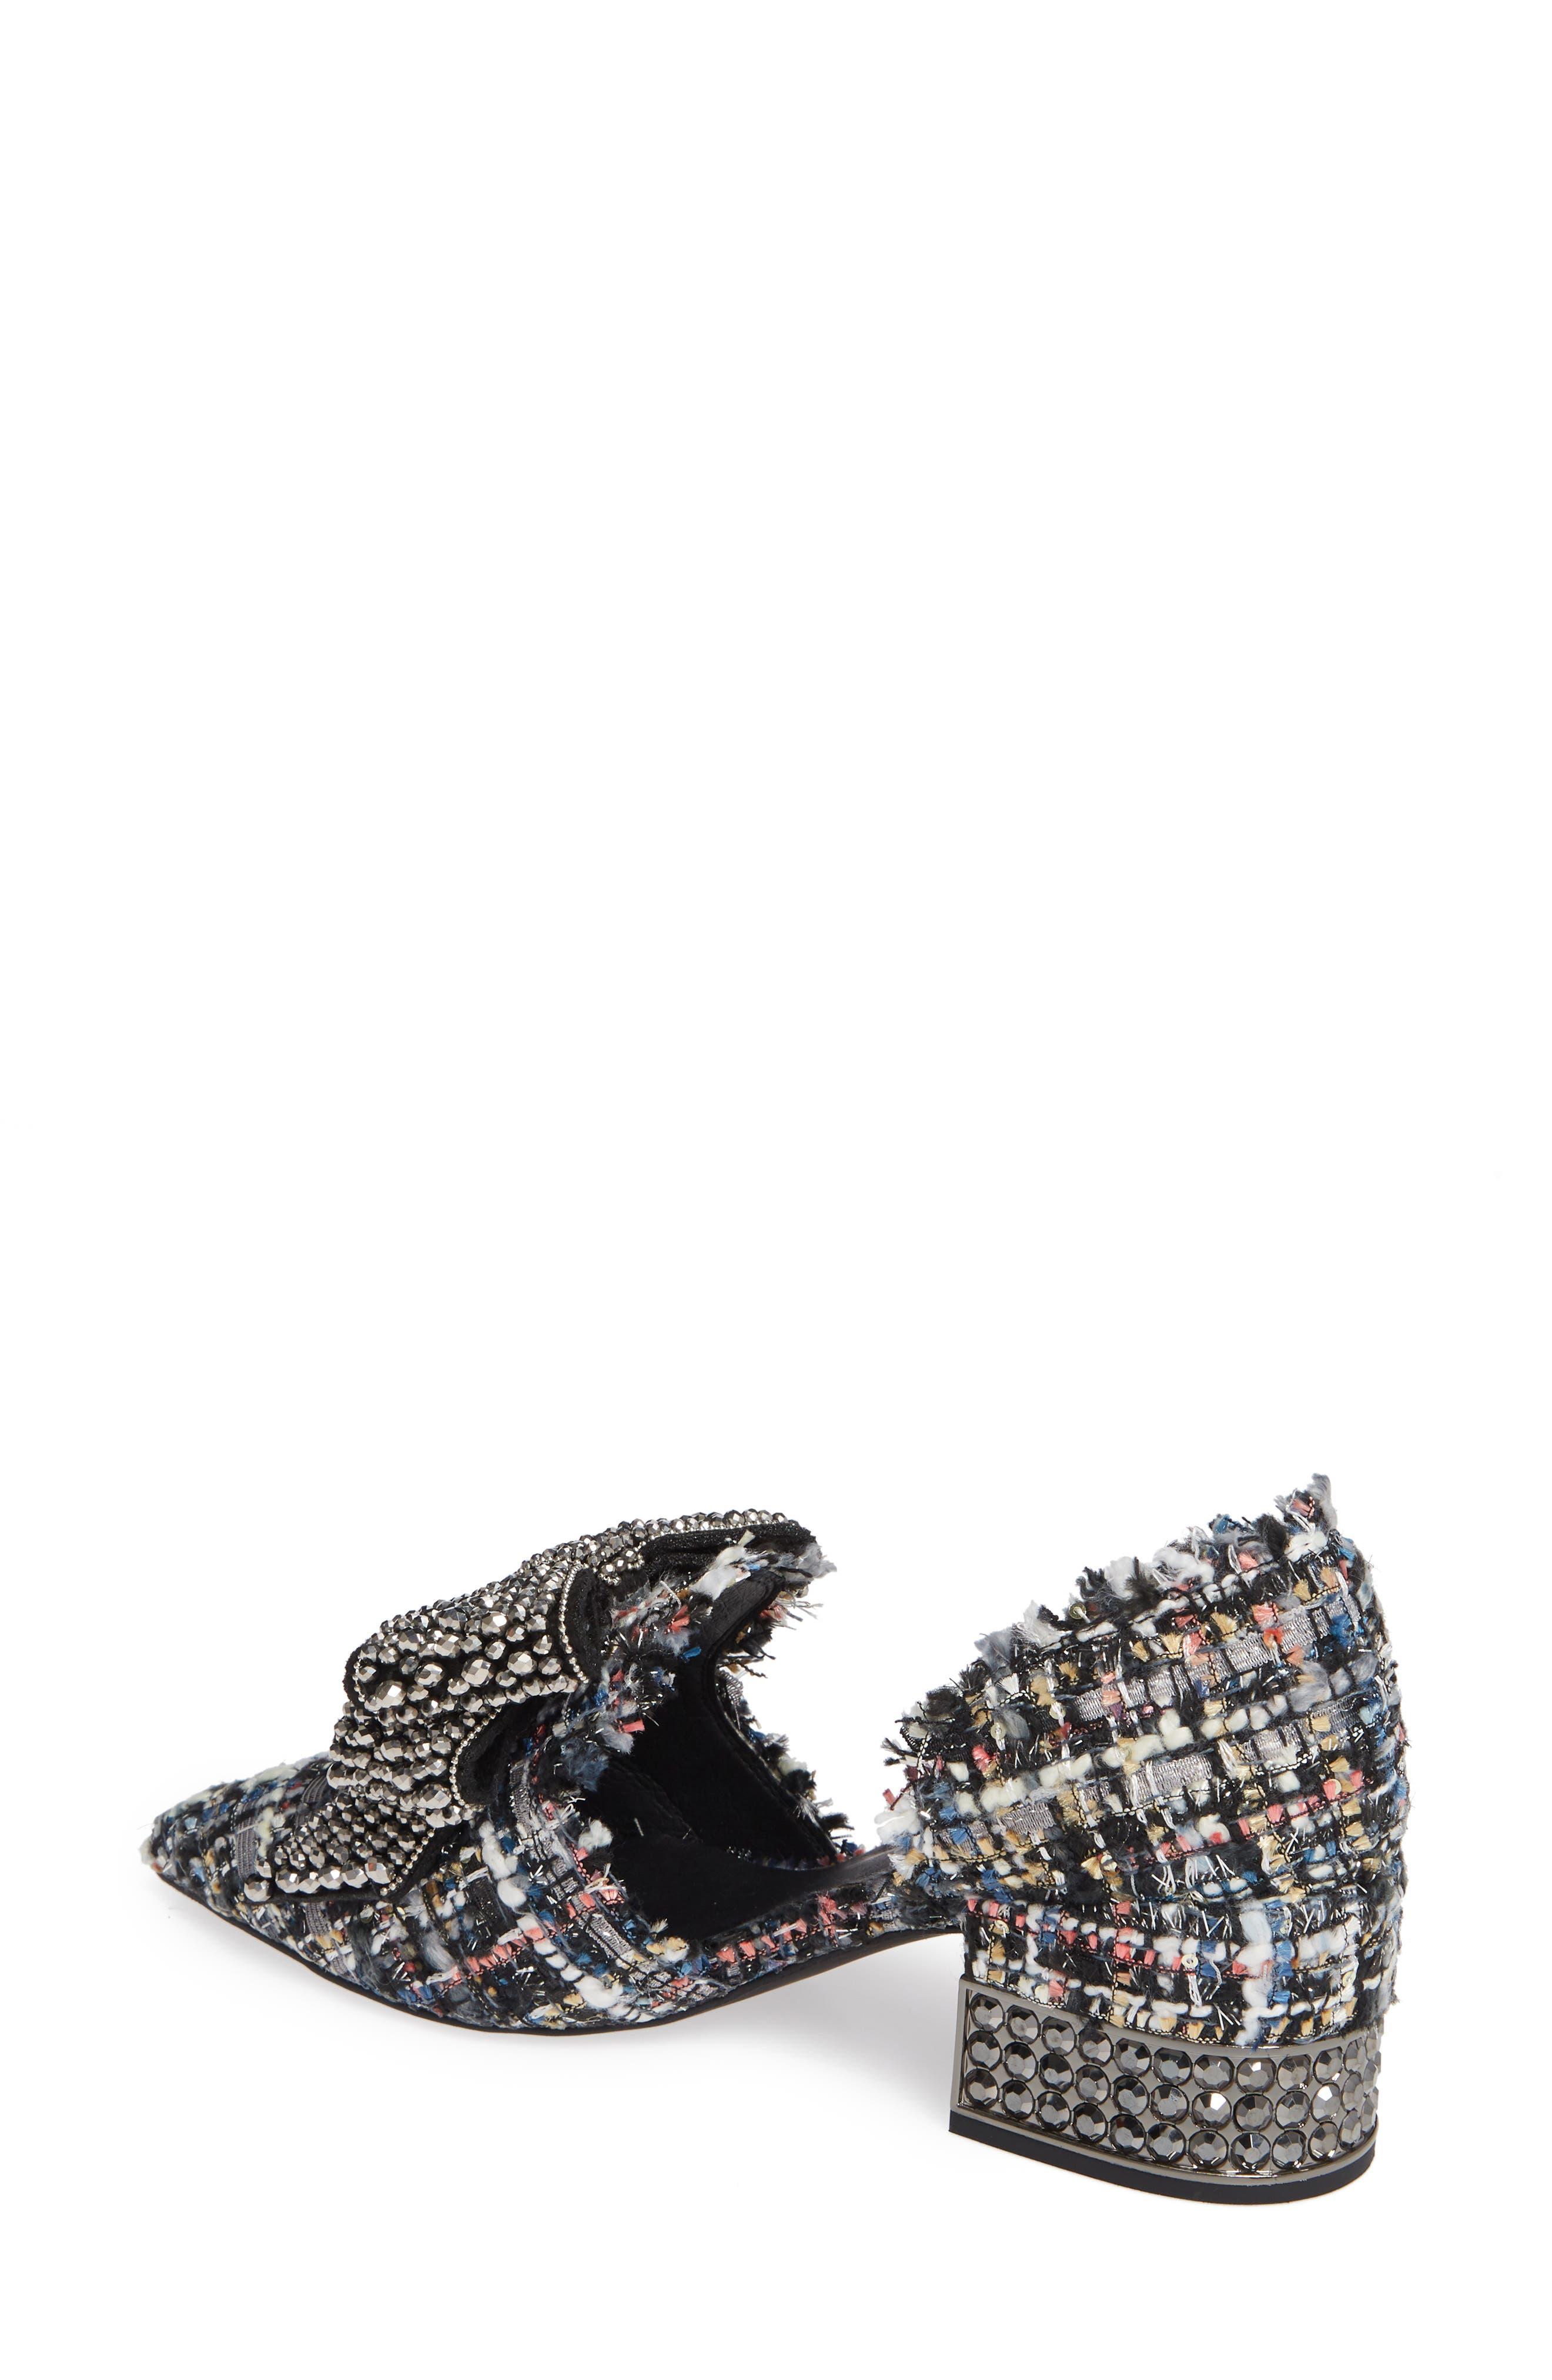 Valenti Embellished Bow Loafer,                             Alternate thumbnail 2, color,                             Black Multi Tweed Pewter